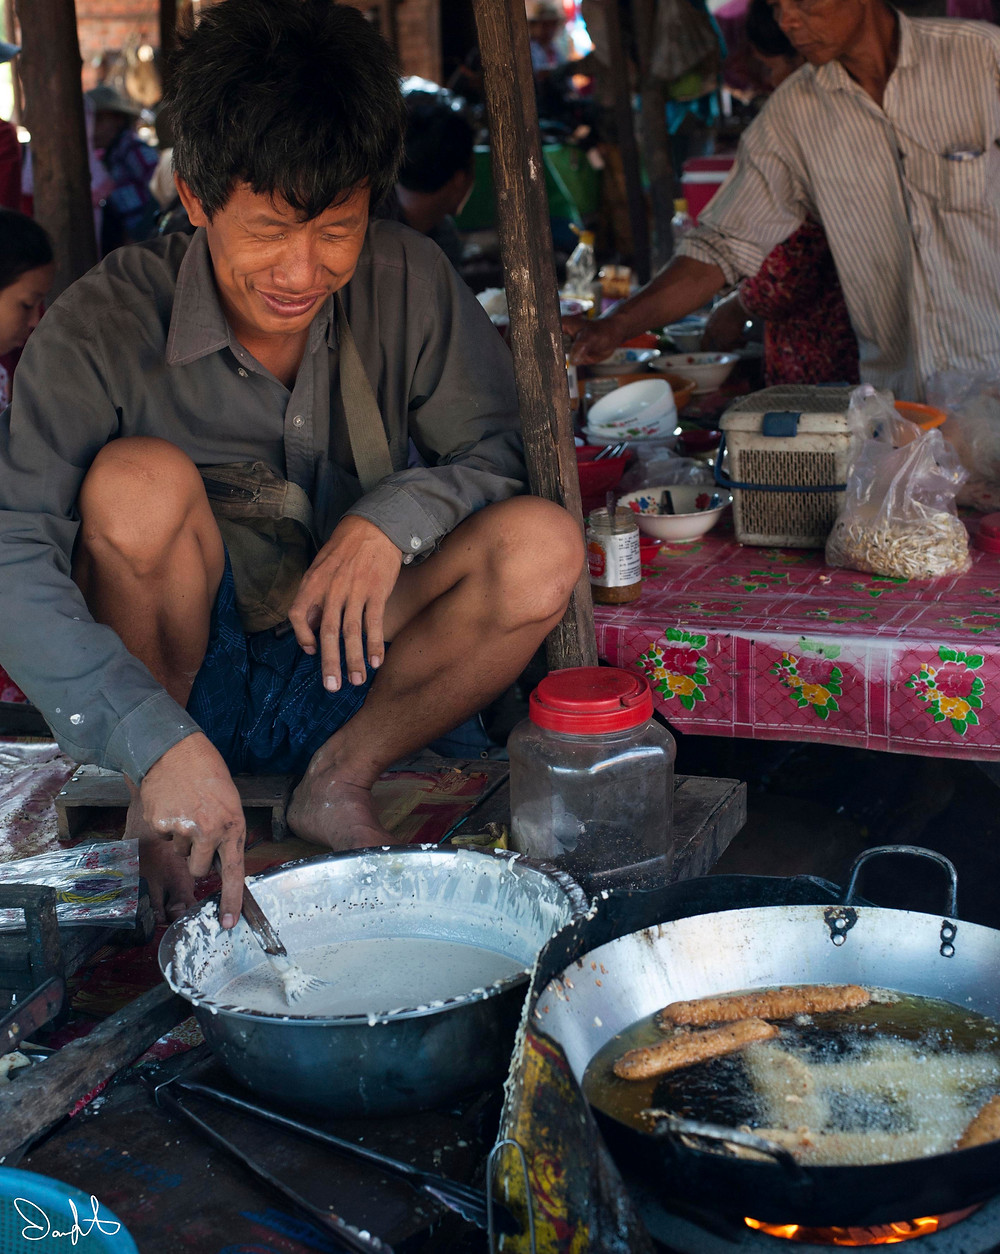 Man frying up breakfast at market, Siem Reap, Cambodia